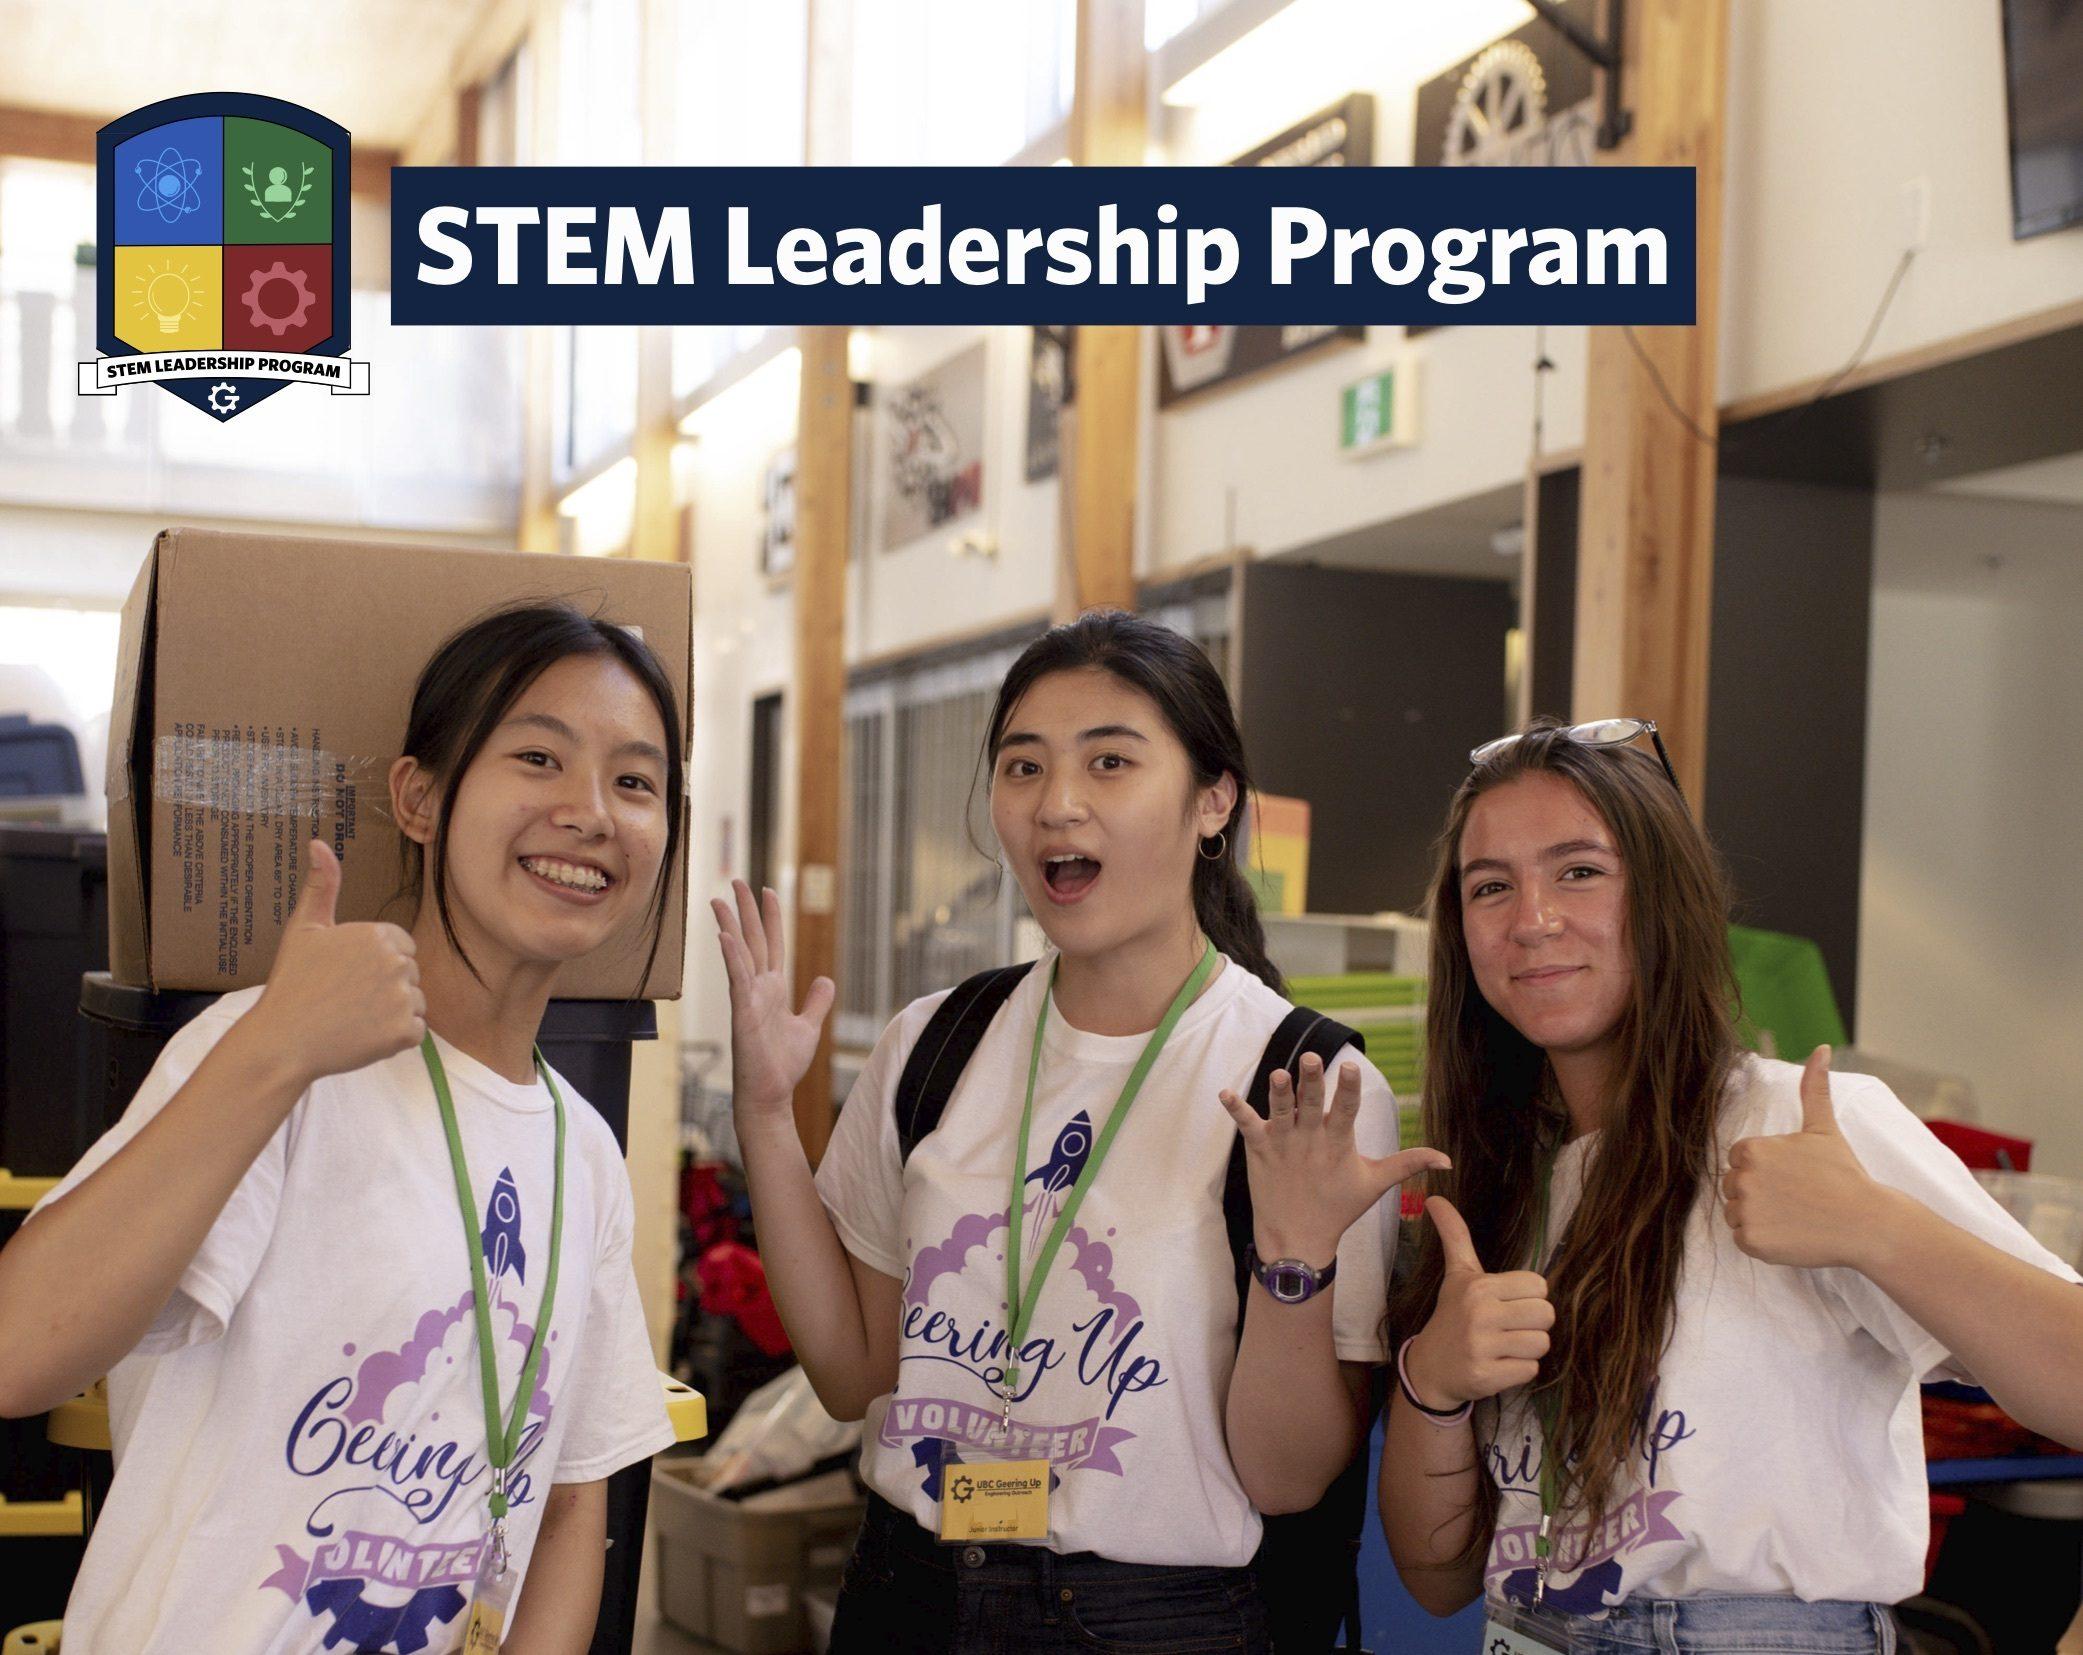 STEM Leadership Program